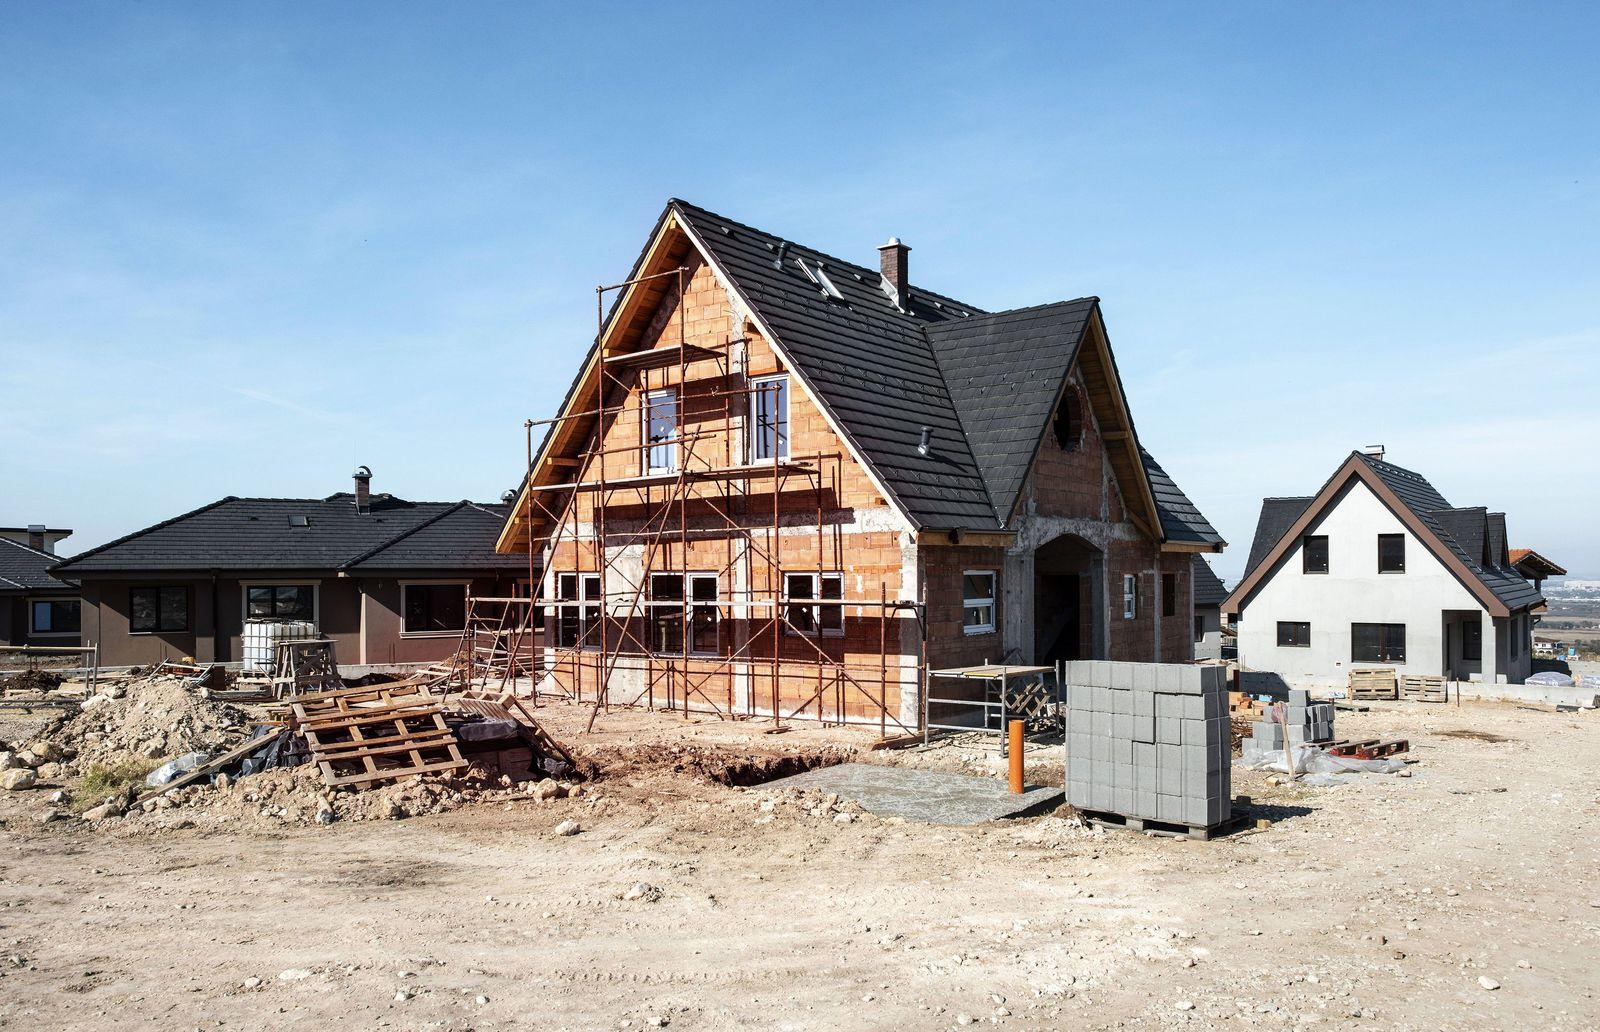 Bulgaria Plovdiv one family house under construction property released PUBLICATIONxINxGERxSUIxAUTx